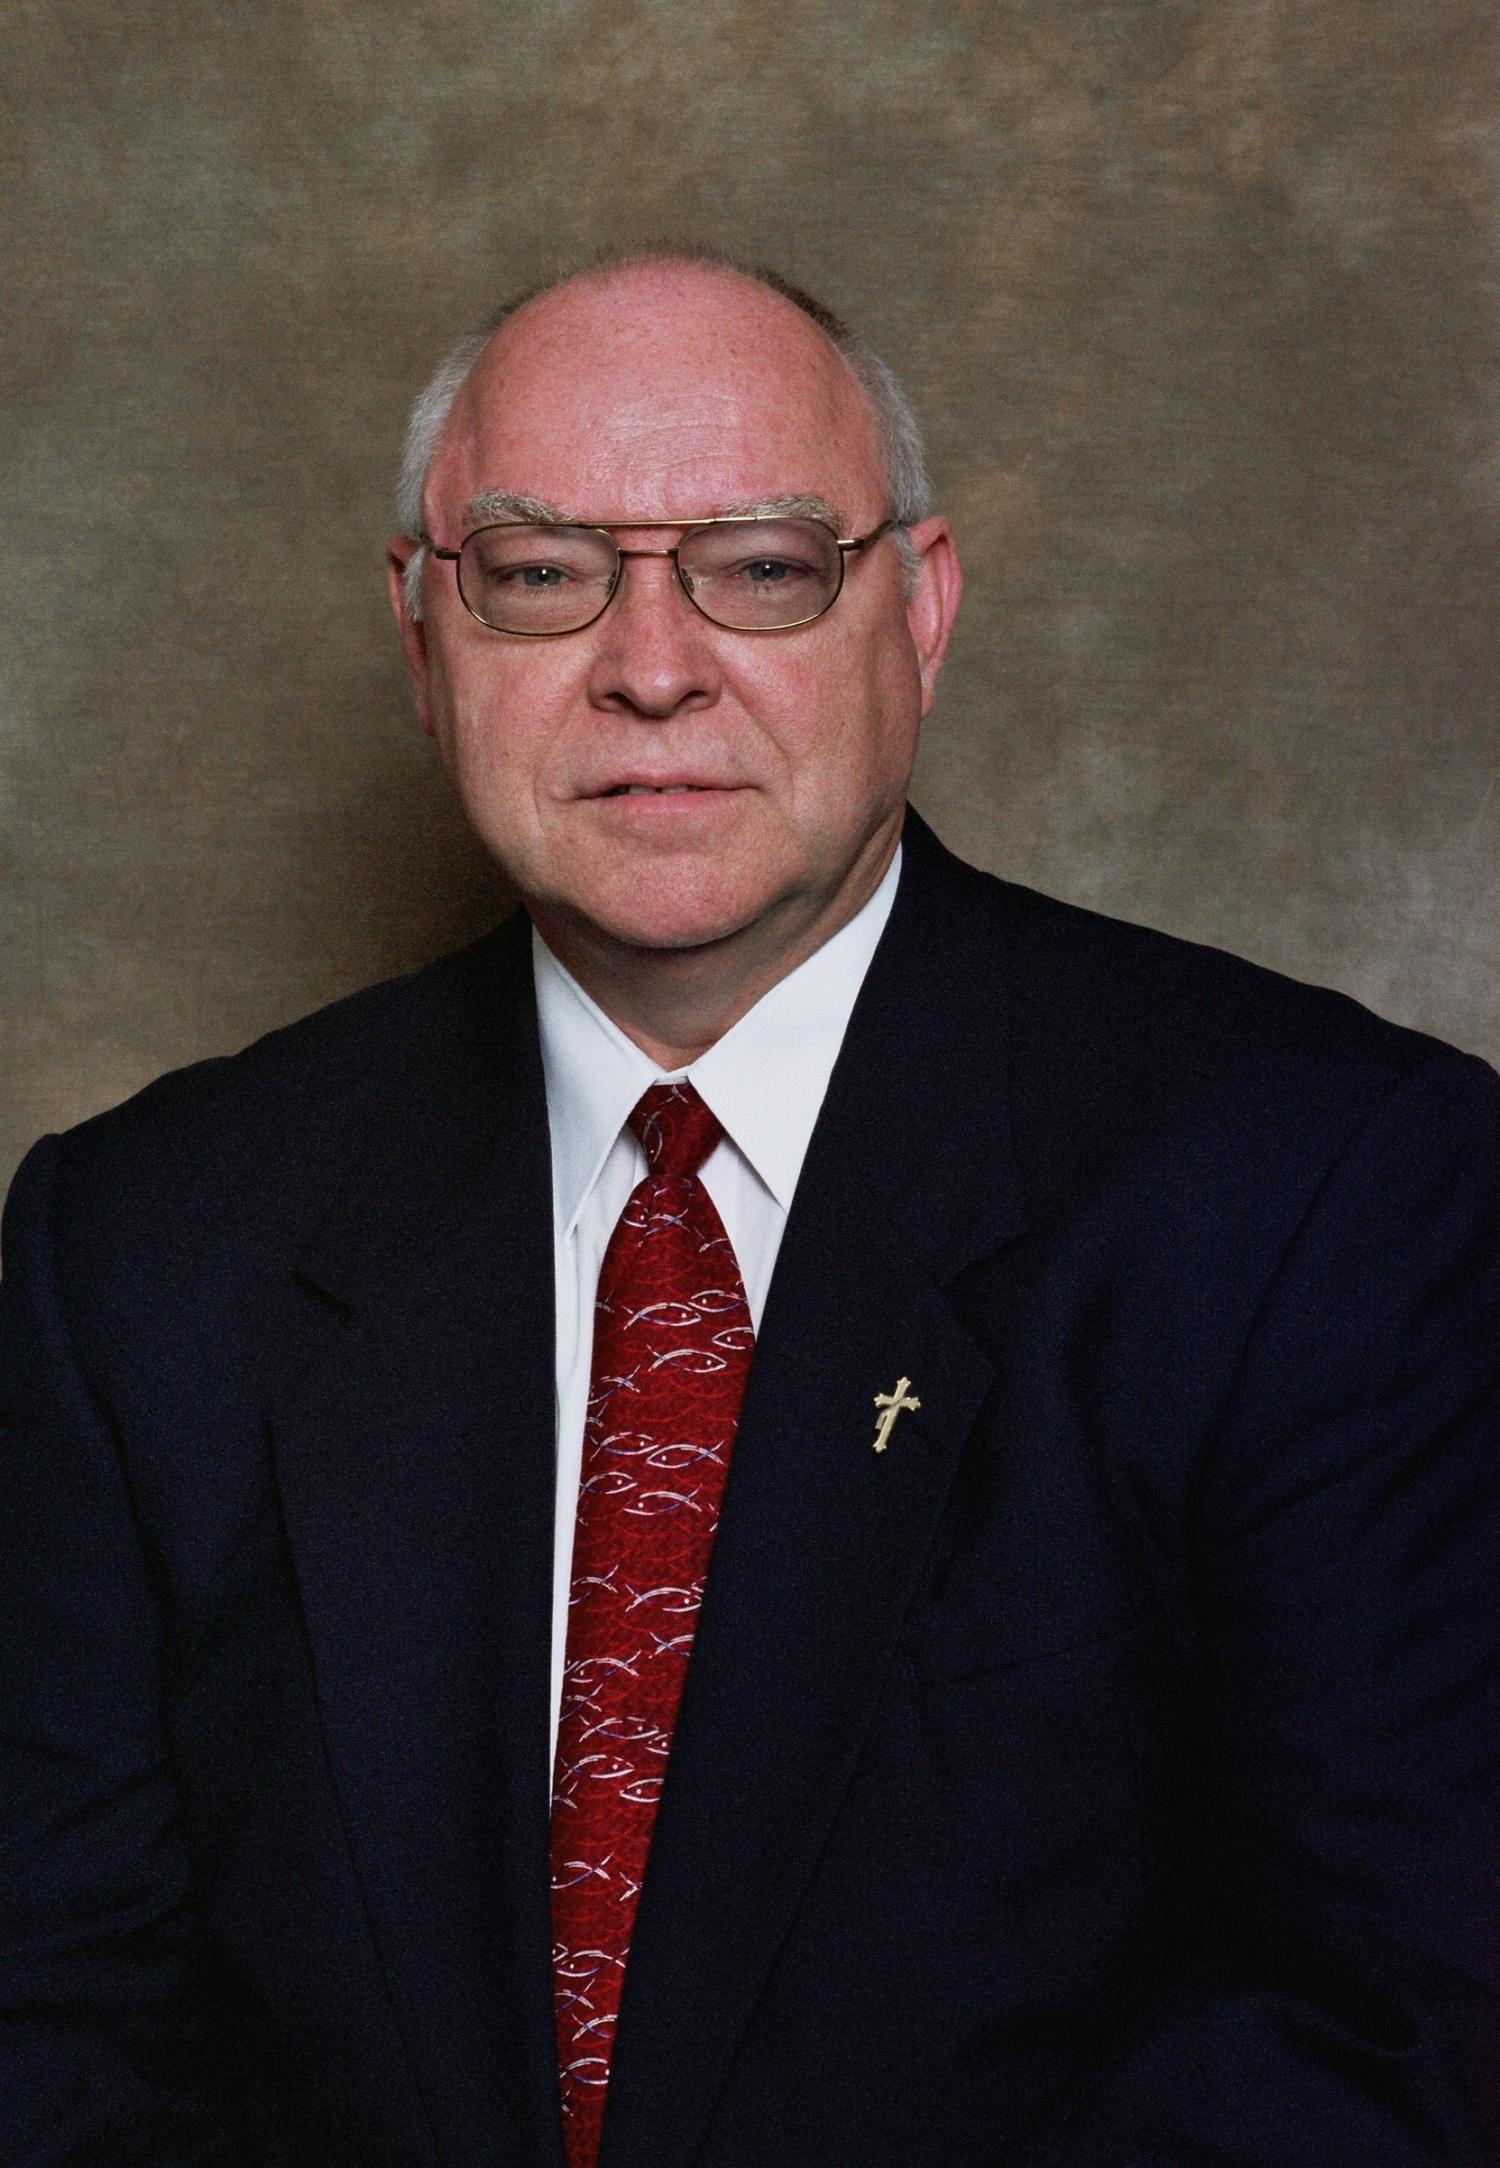 Deacon Mickey Hawkins '66